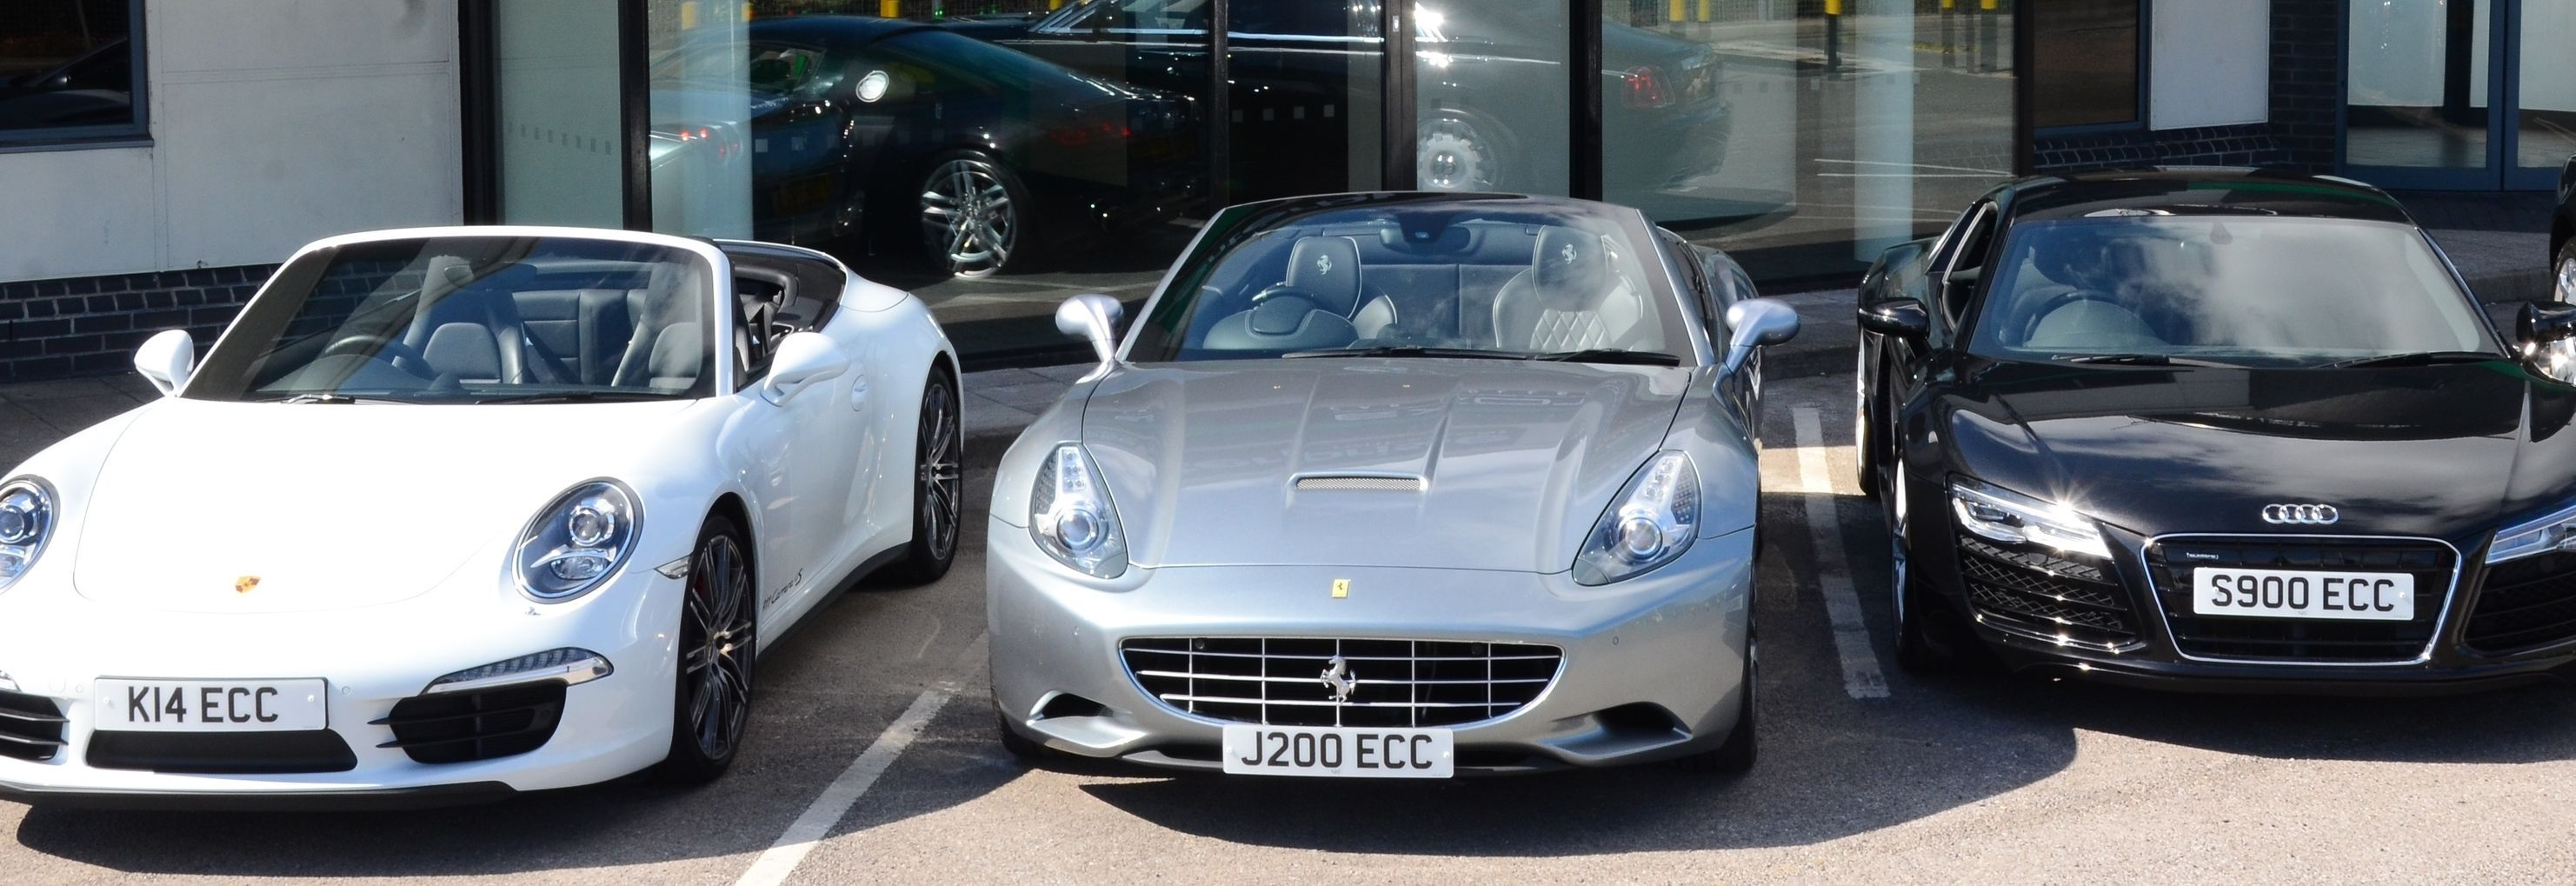 Official Site Luxury Car Rental Luxury Cars Car